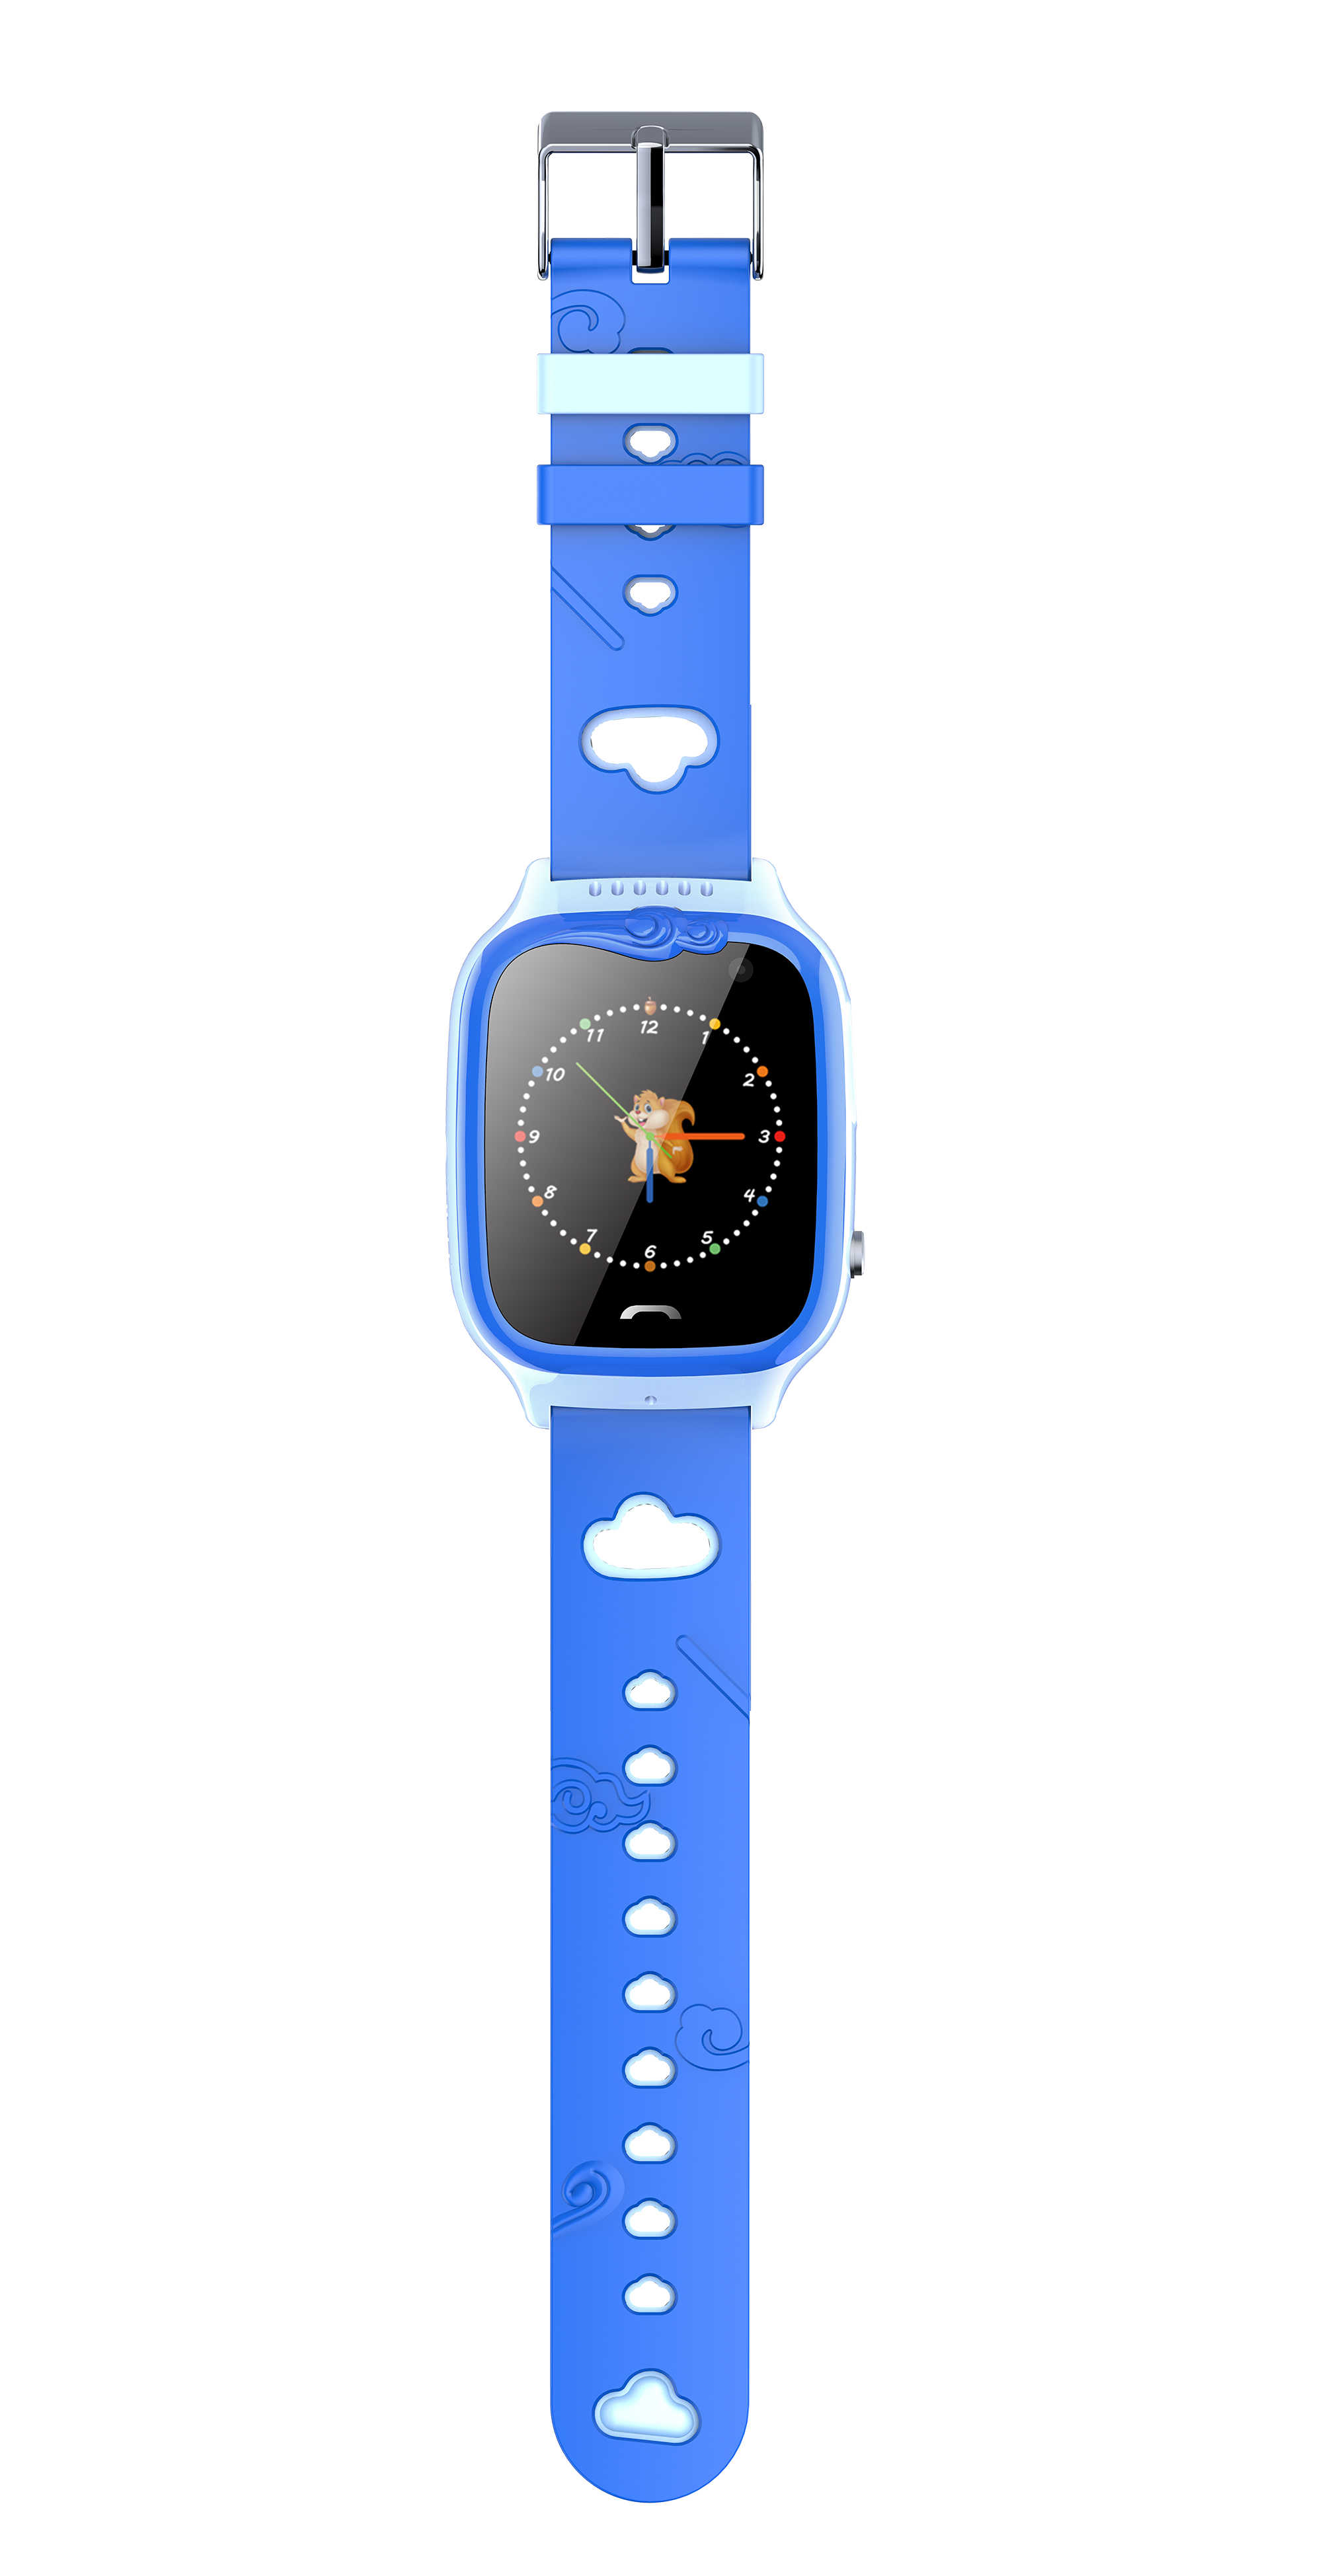 2018 Baru IP67 Tahan Air Smart Aman Akurat Lokasi Tracker SOS Panggilan Remote Monitor Flashlight Watch Jam Tangan untuk Anak-anak Anak